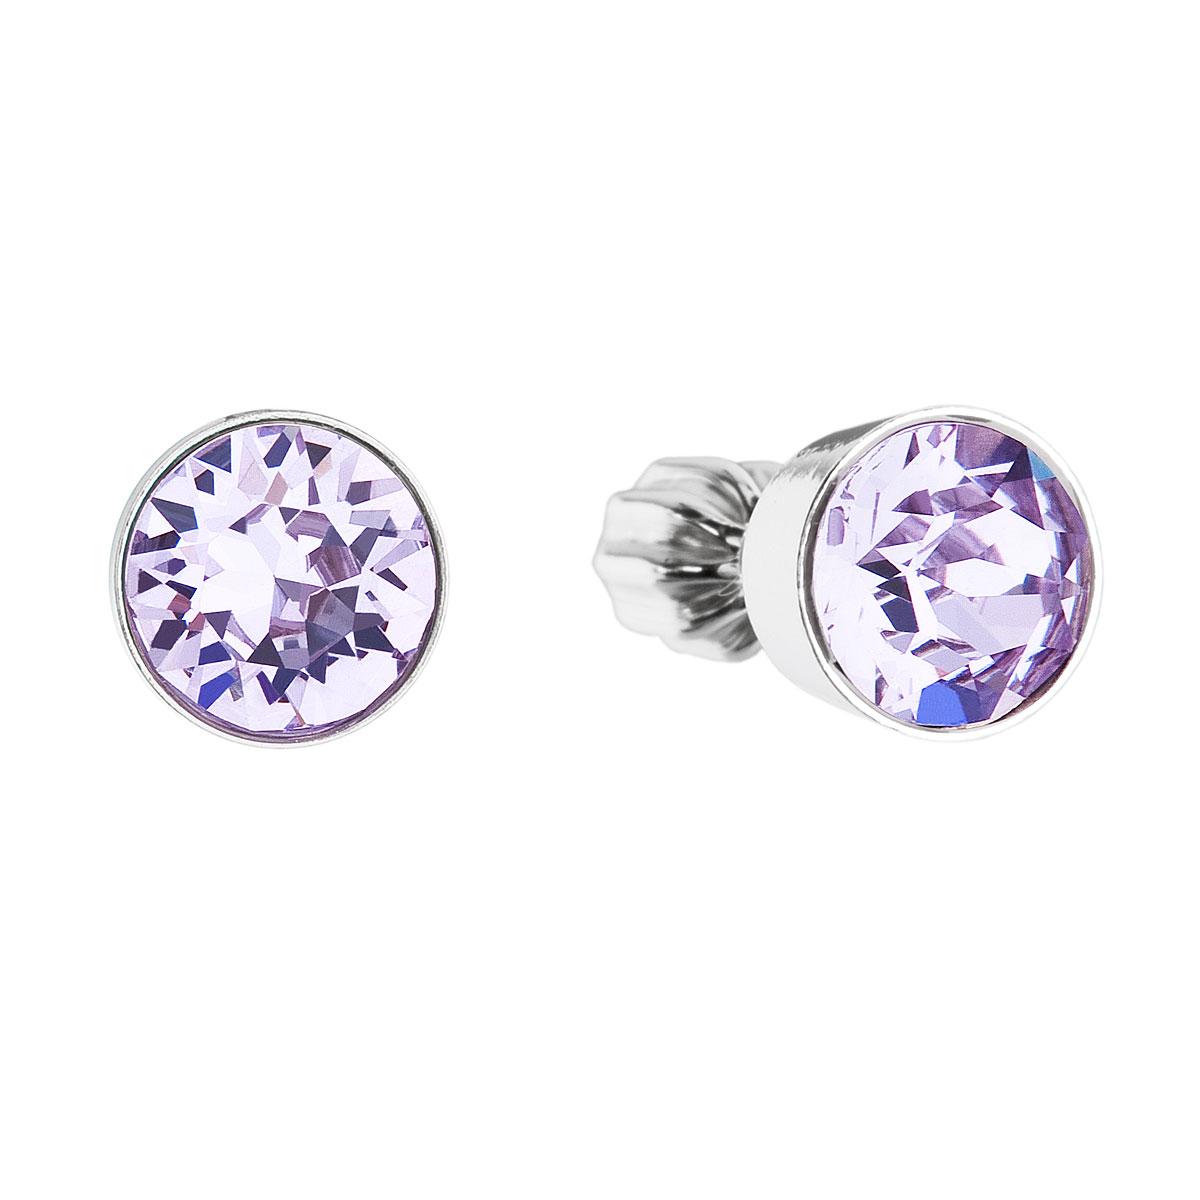 Strieborné náušnice kôstka s krištálmi fialové okrúhle 31113.3 violet